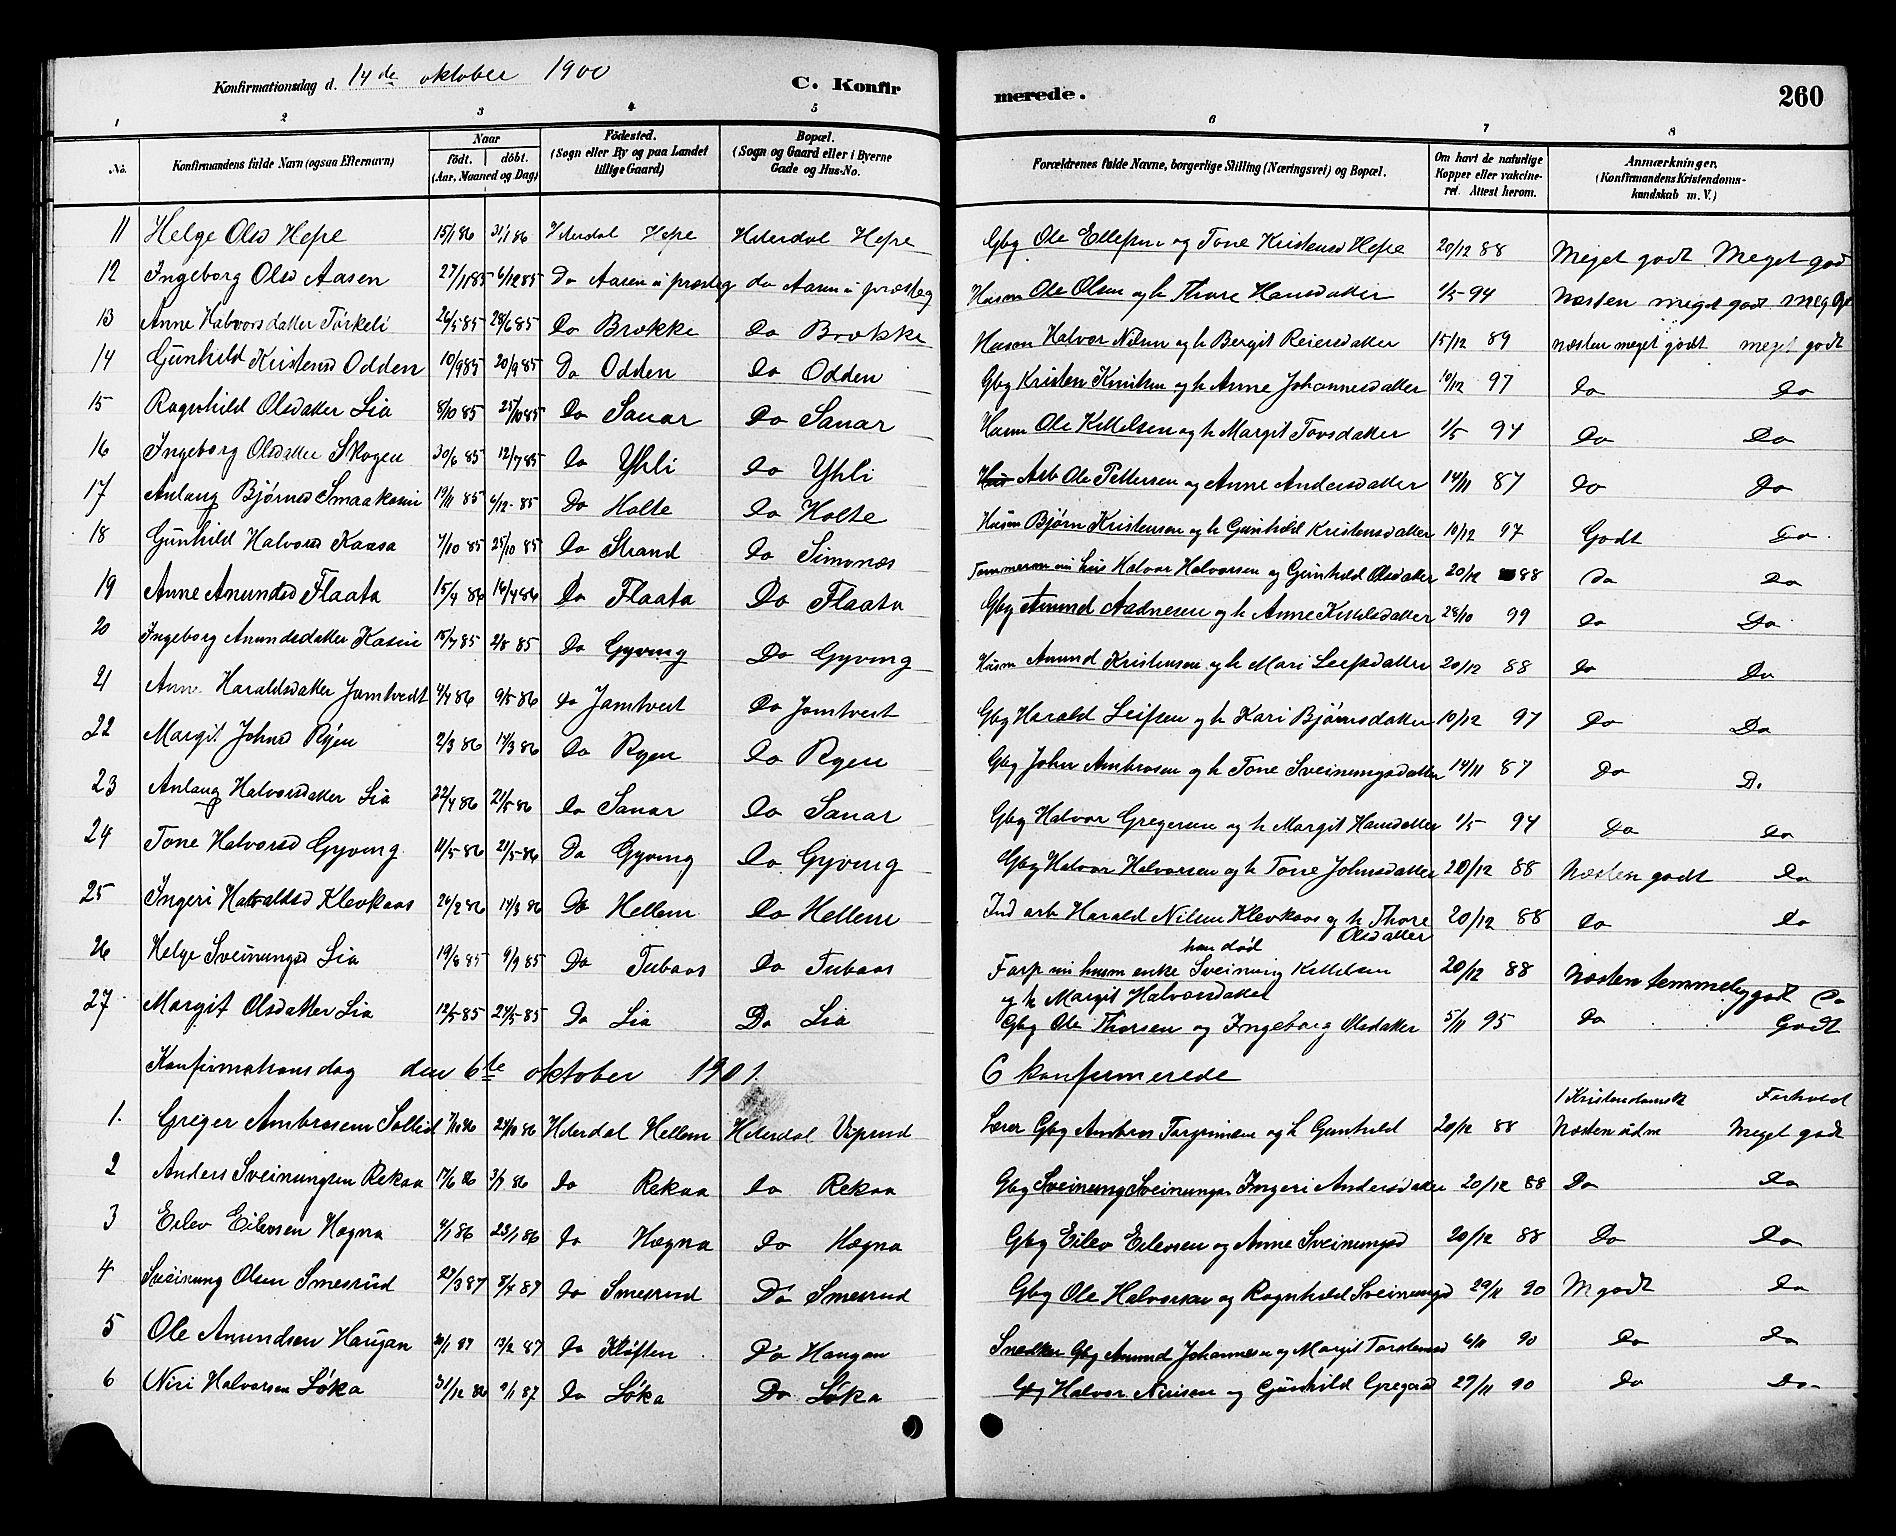 SAKO, Heddal kirkebøker, G/Ga/L0002: Klokkerbok nr. I 2, 1879-1908, s. 260